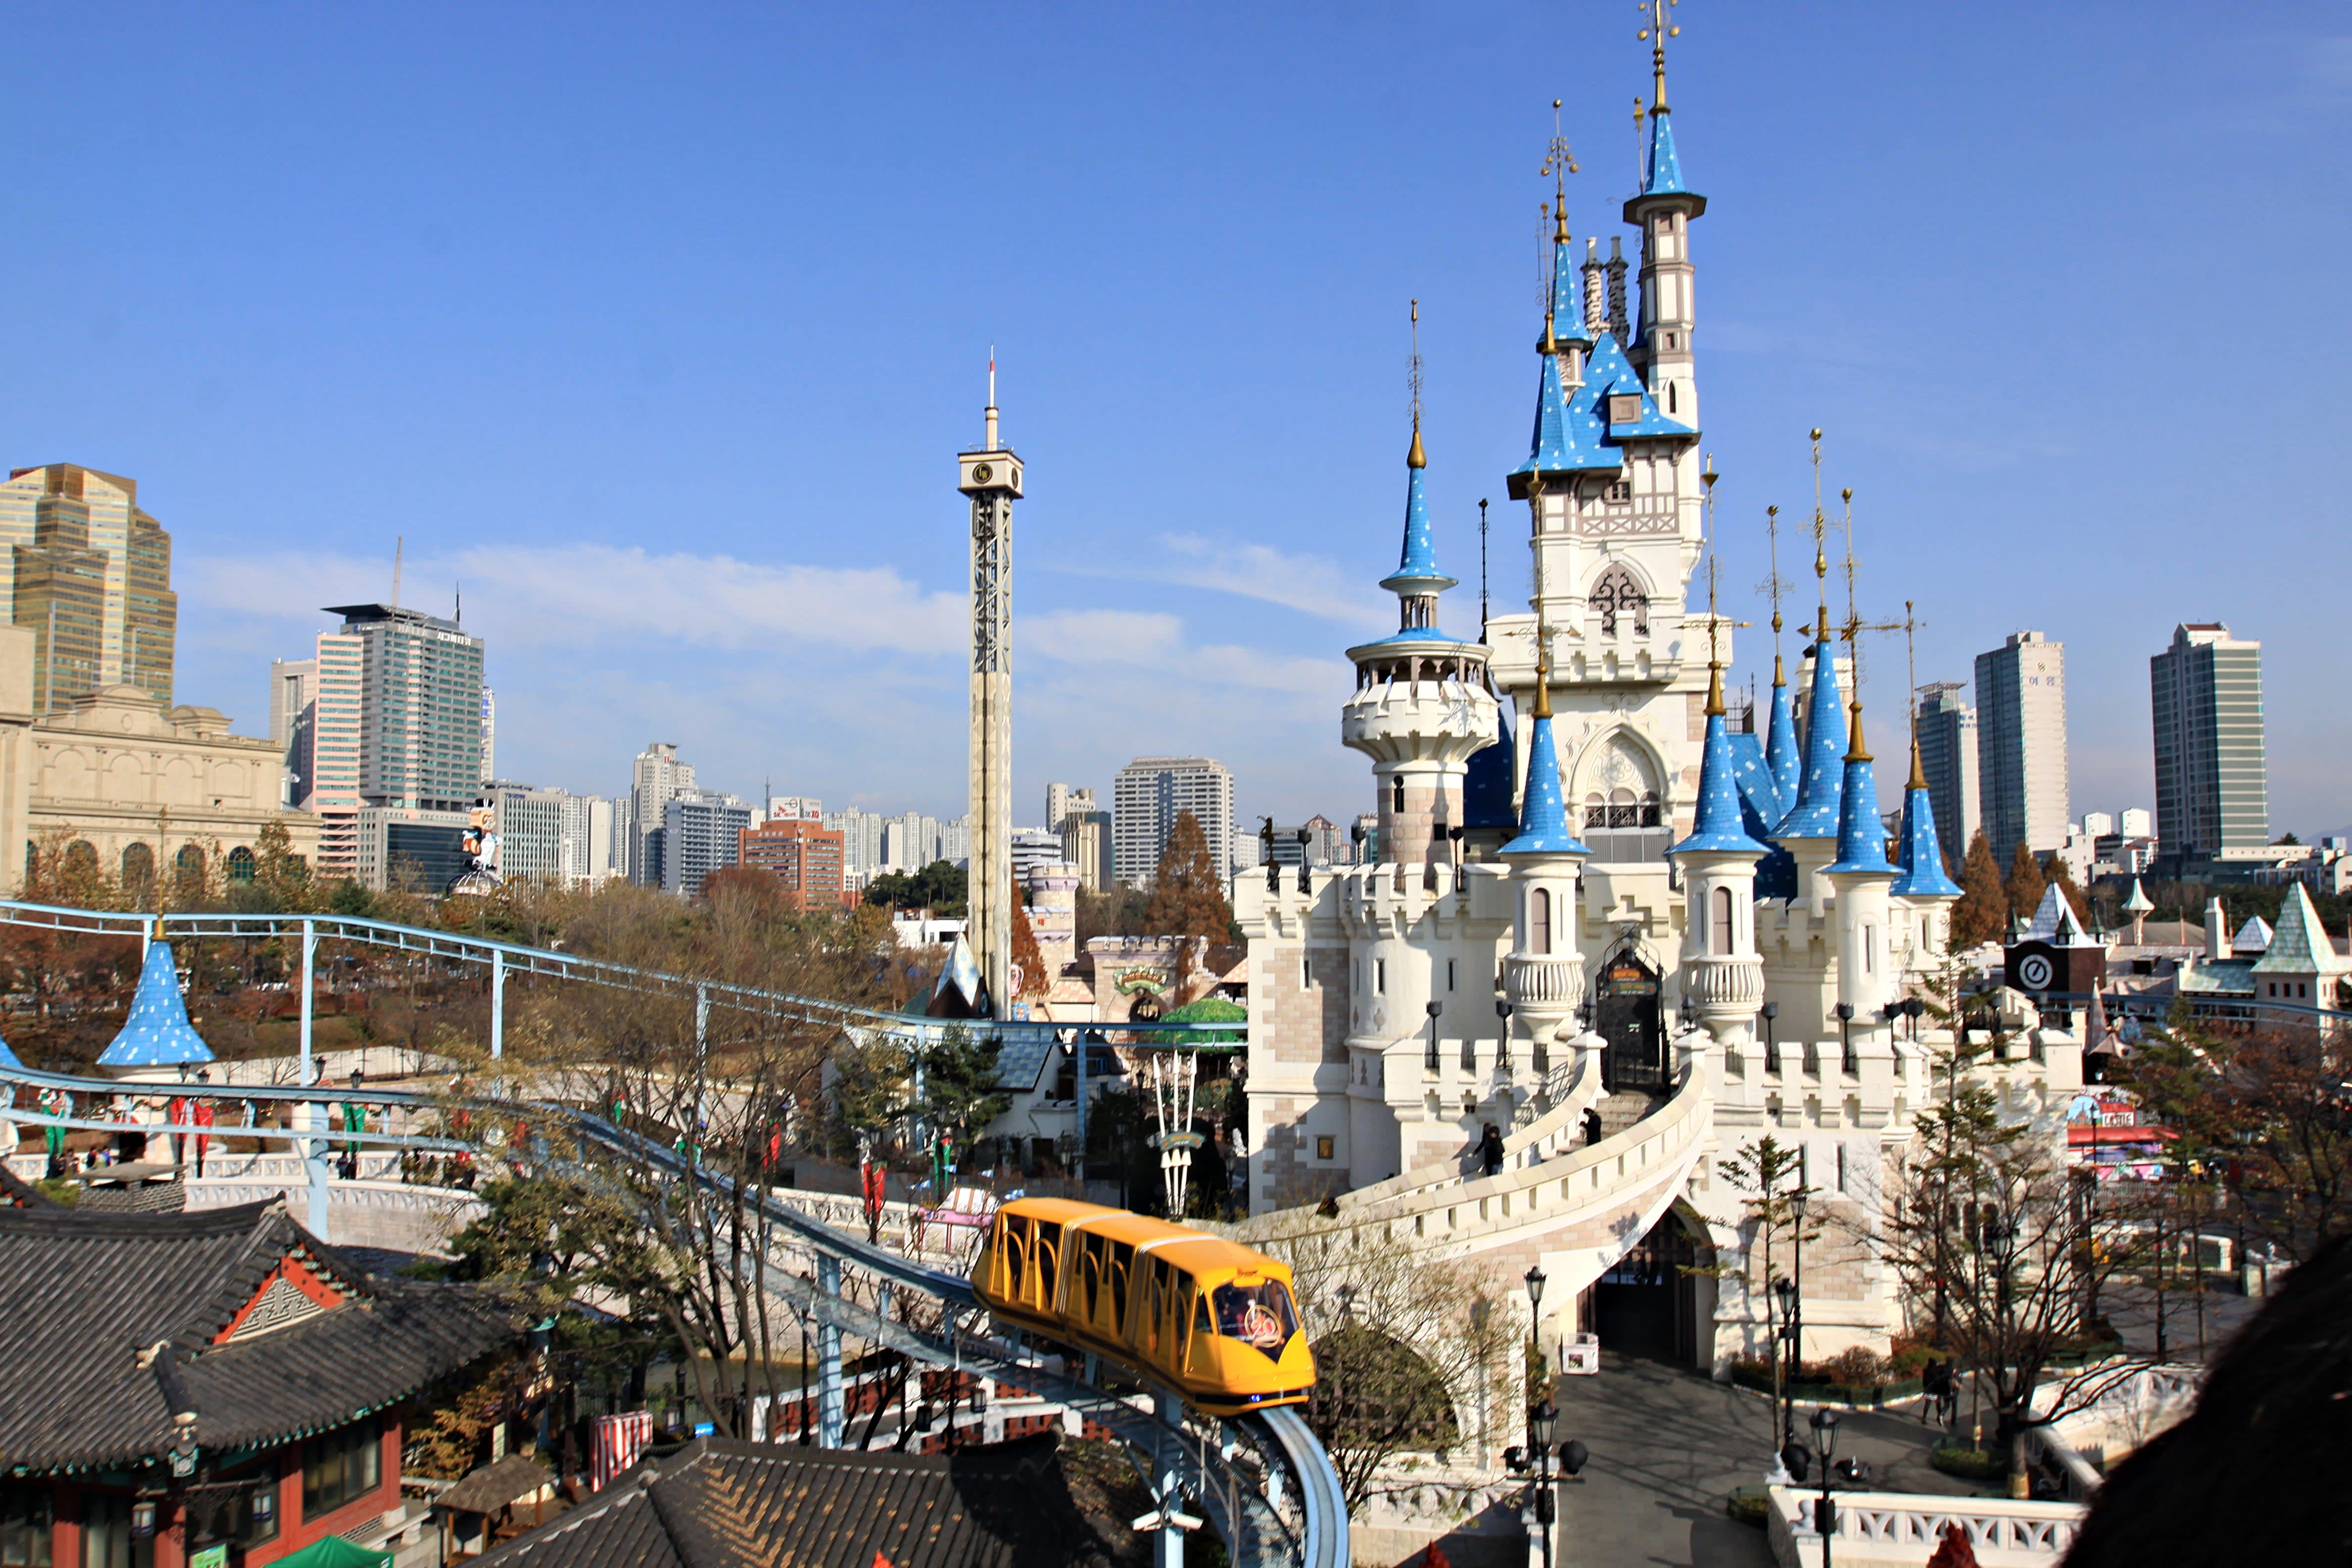 Lotte World สวนสนุก เกาหลีใต้